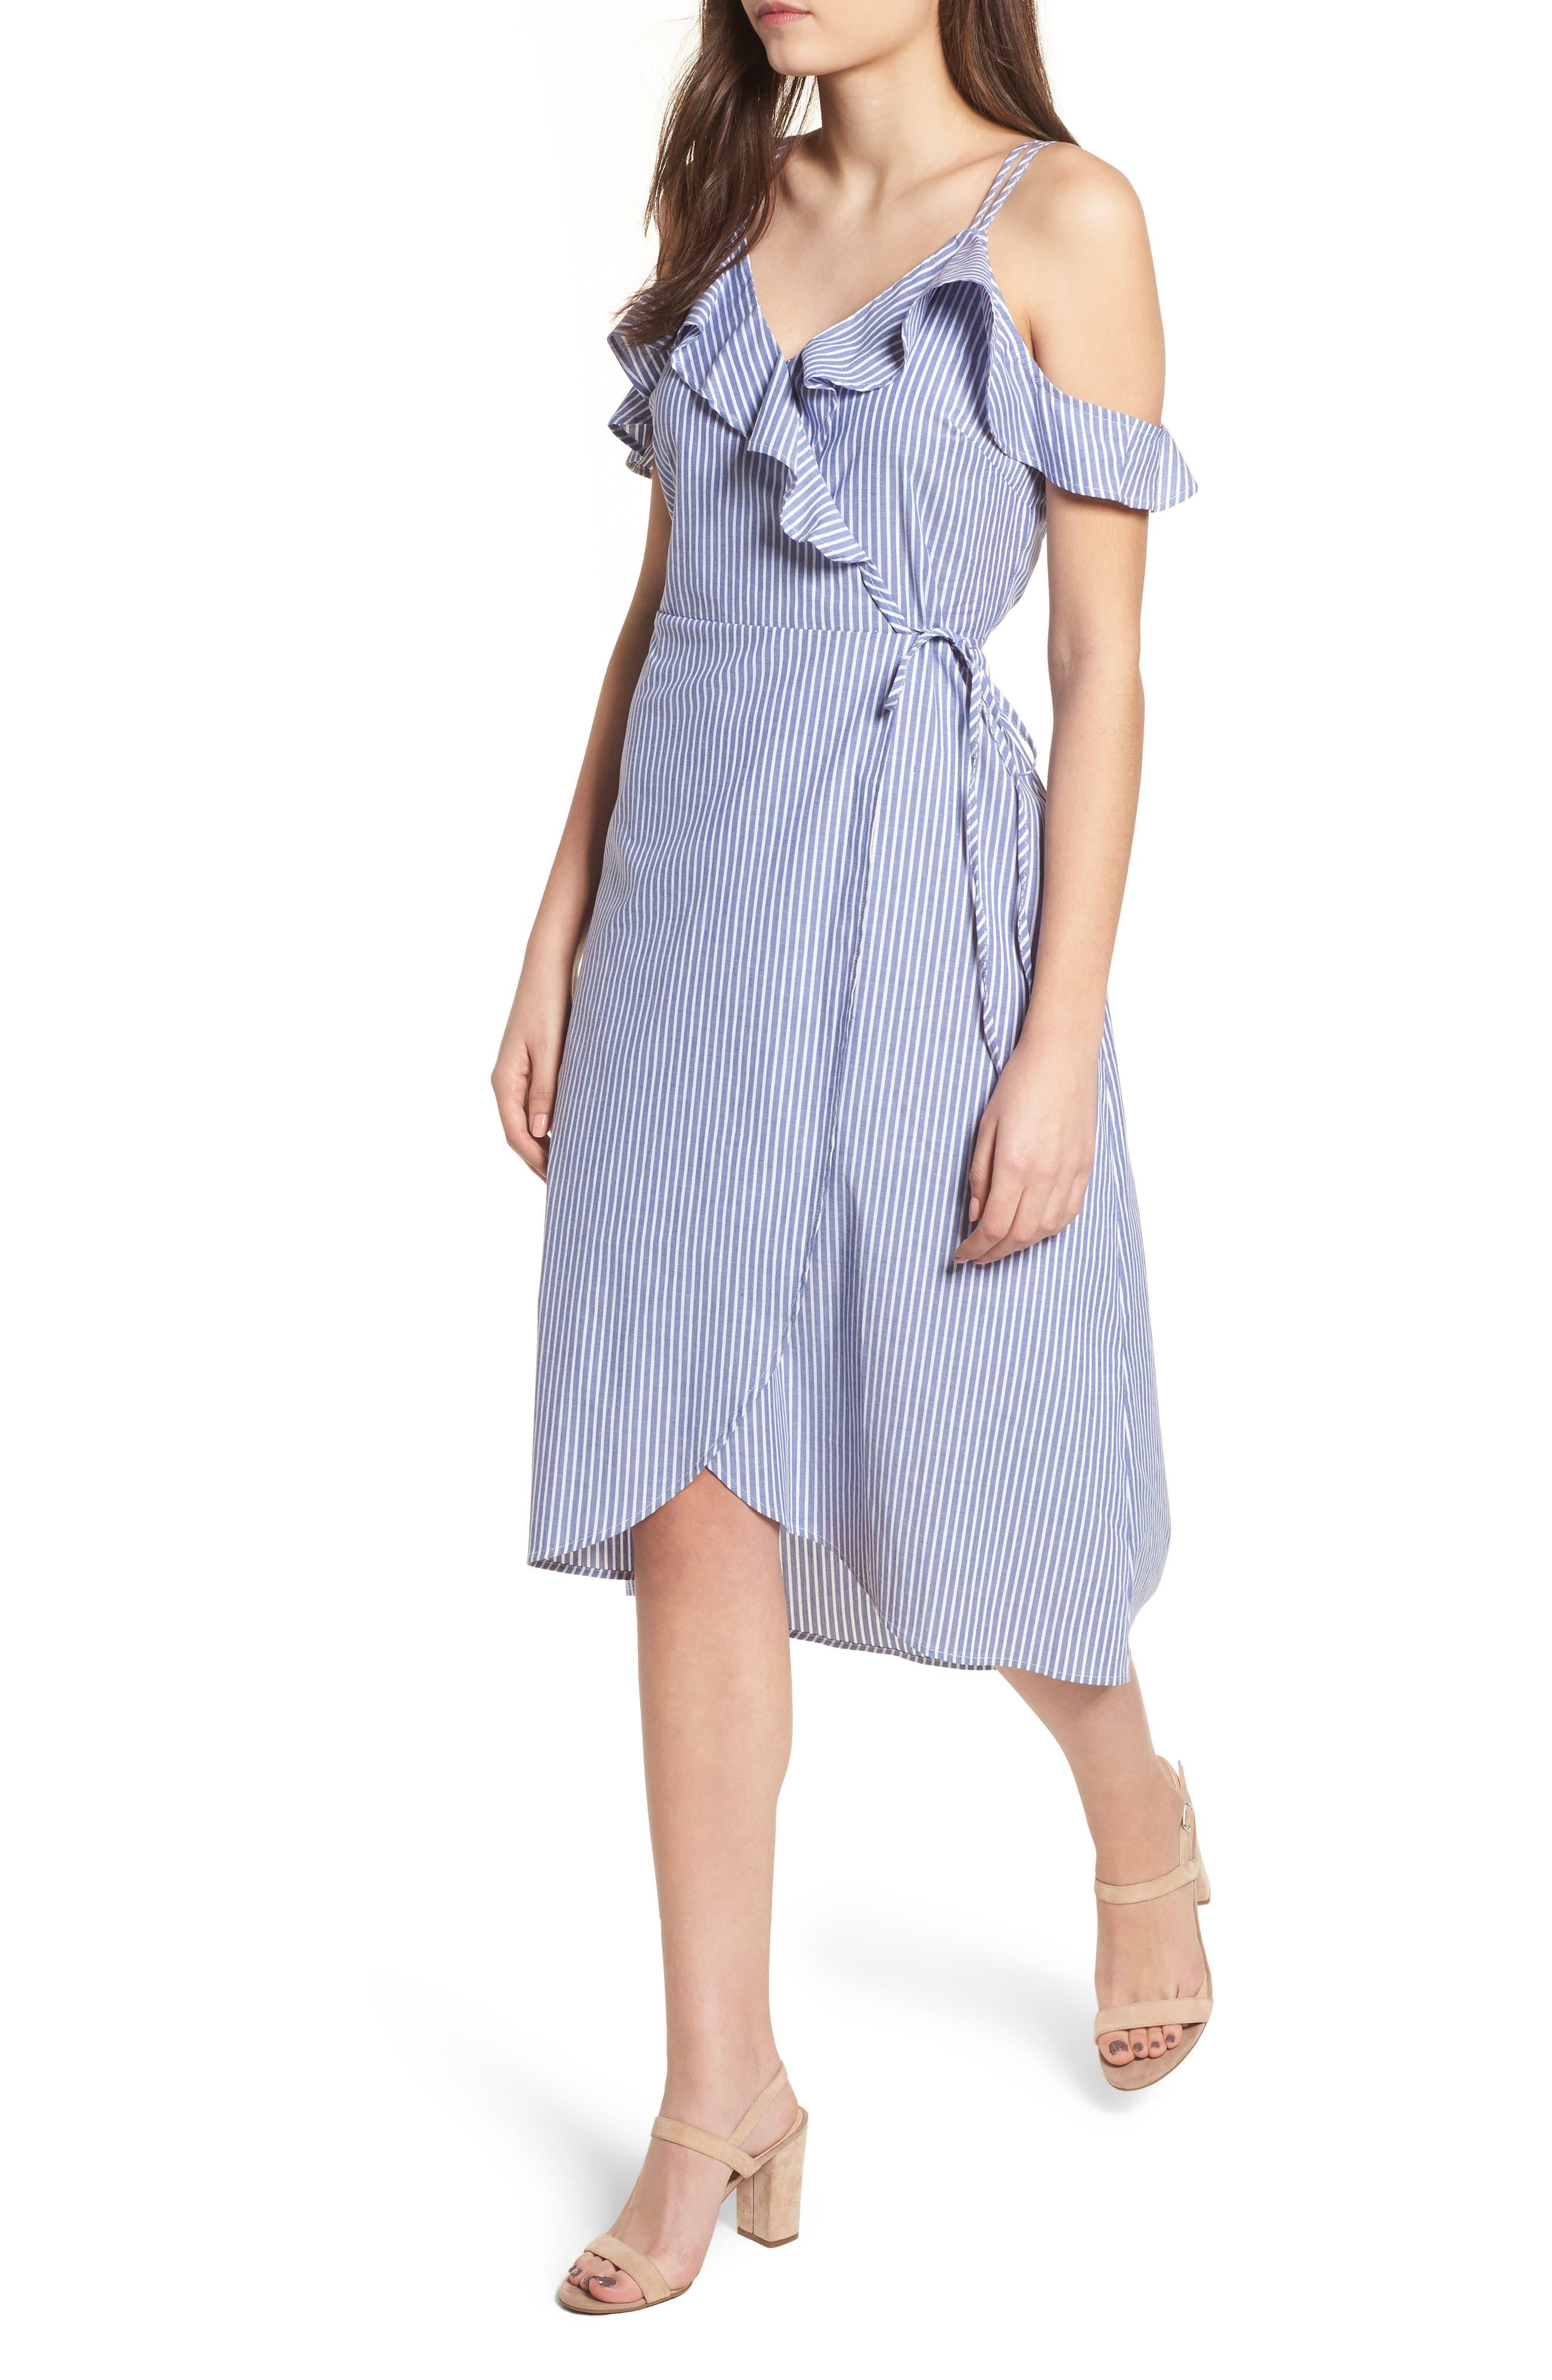 Womens Nicole Sleeveless Dress Unique 21 RMUnpQ8orU